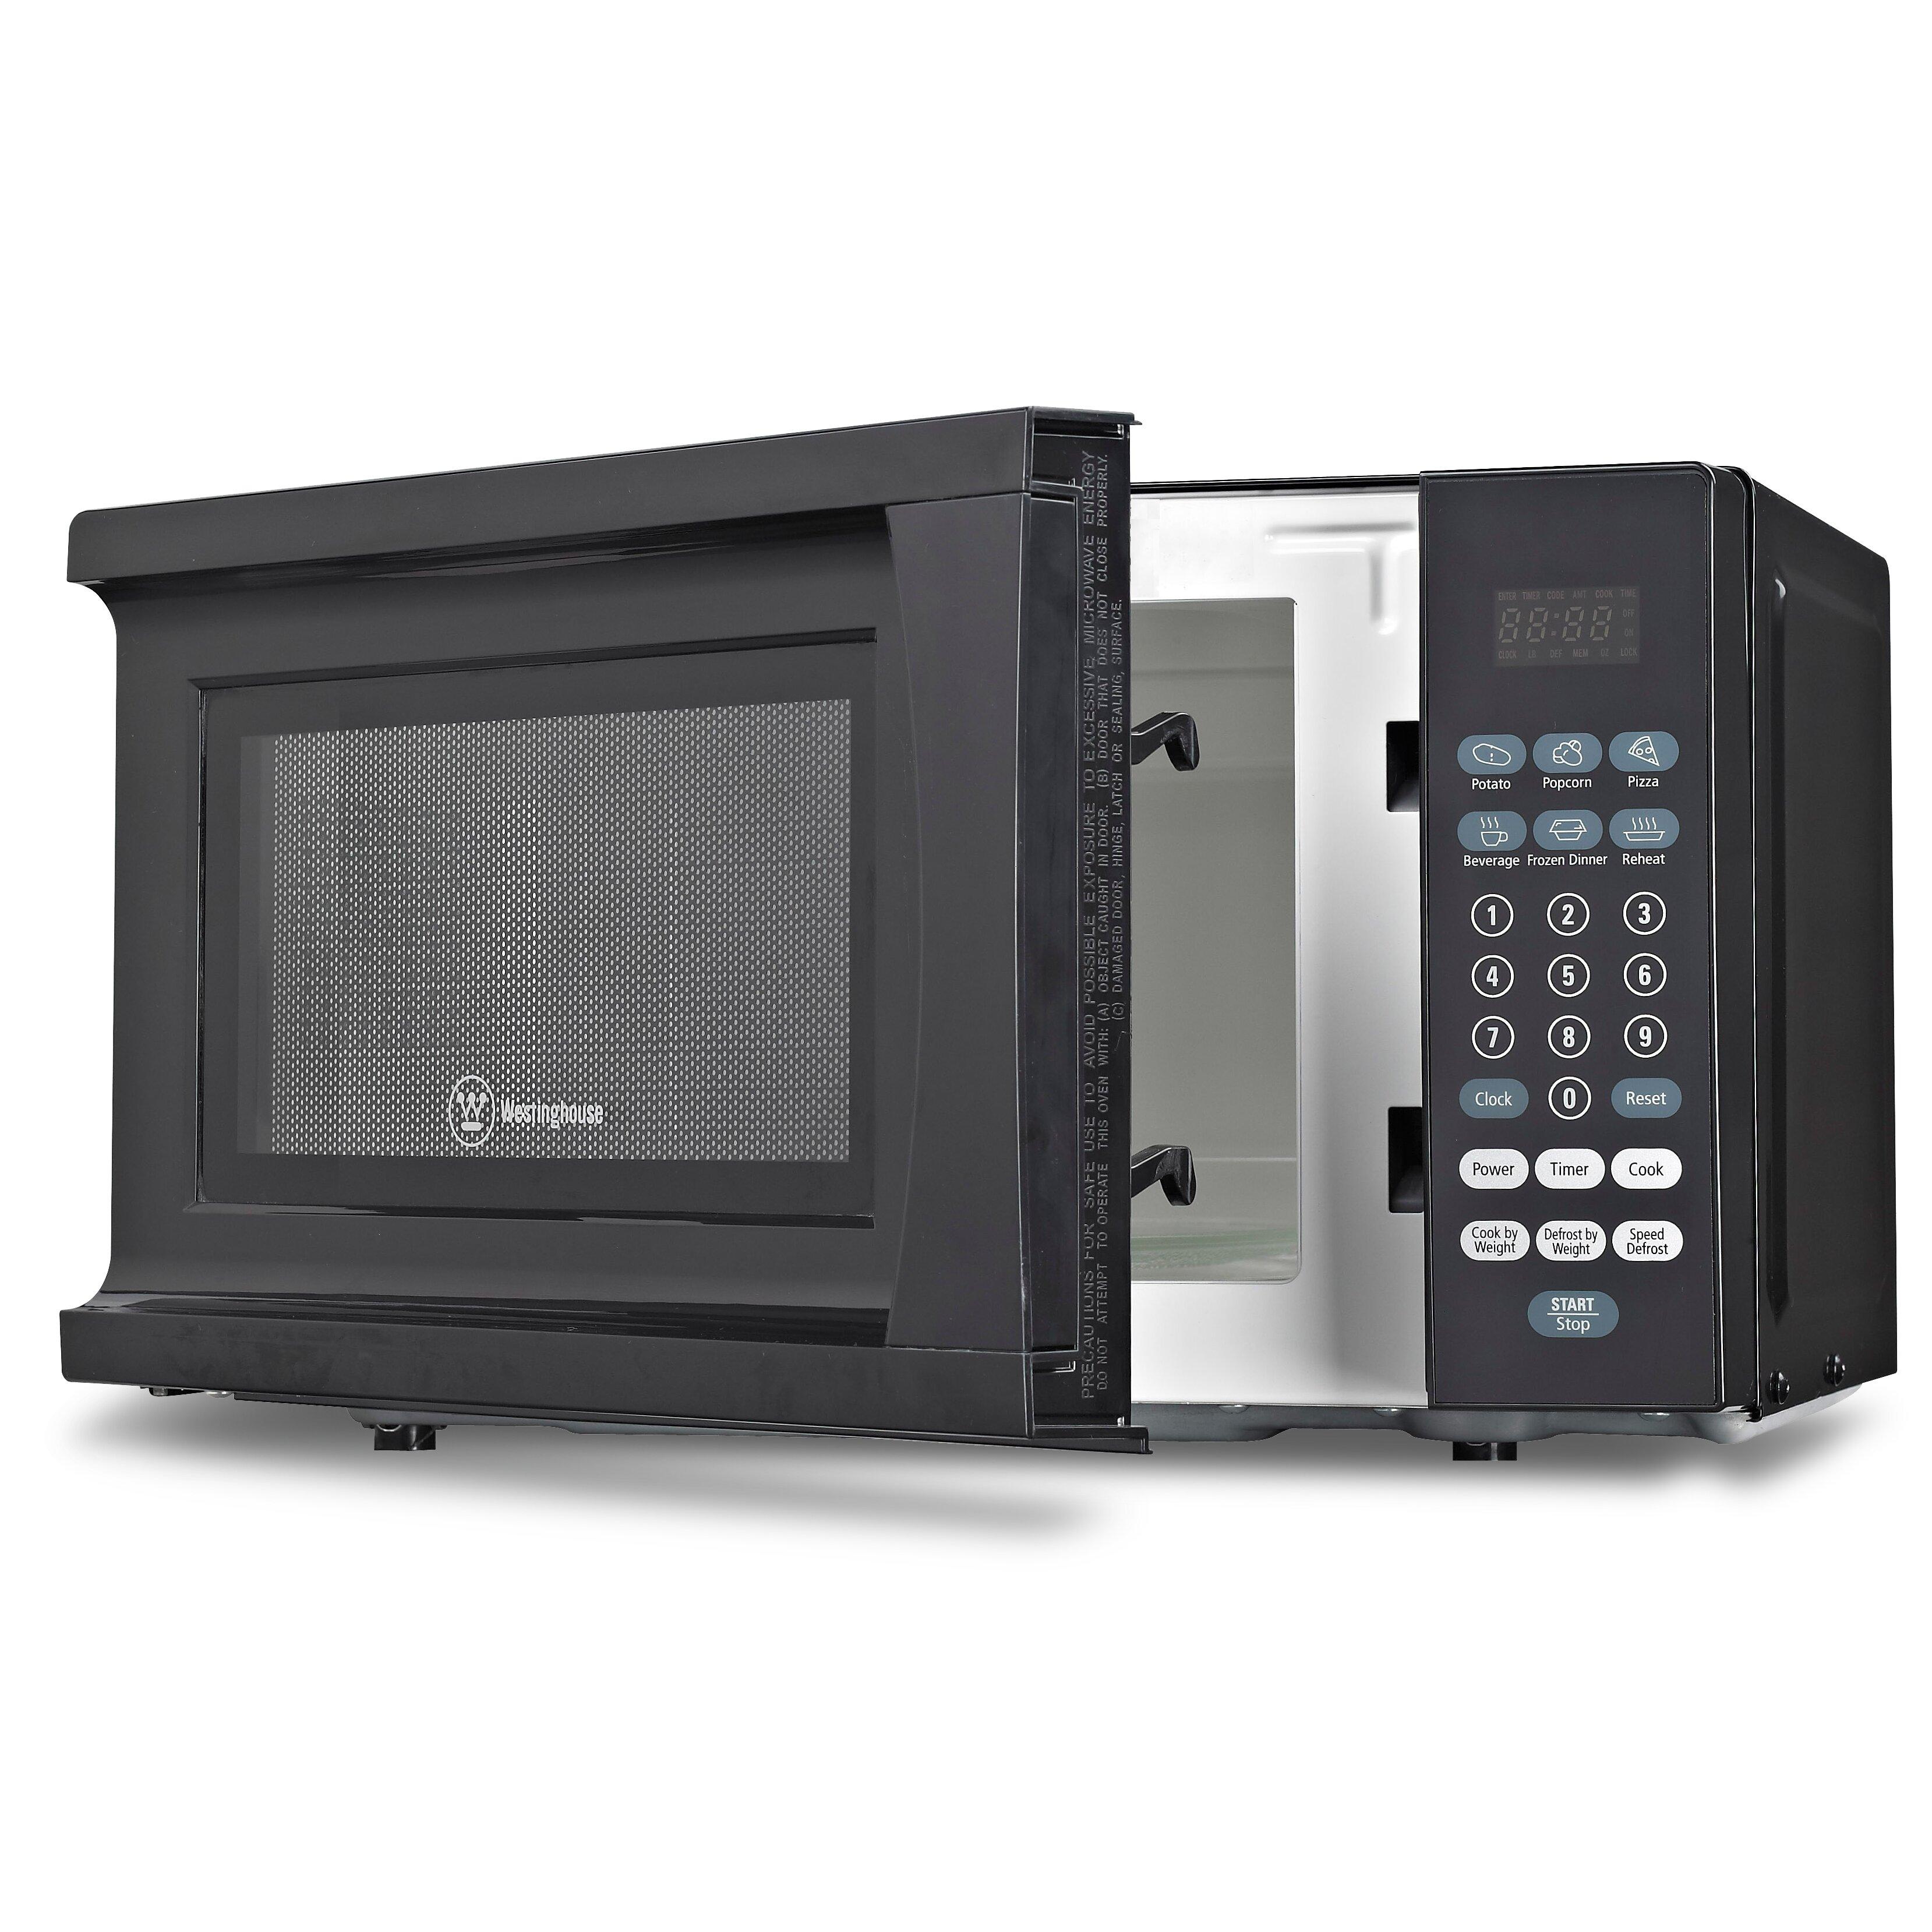 Countertop Microwave Walmart Canada : Home Improvement Appliances ... Countertop Microwaves Westinghouse ...